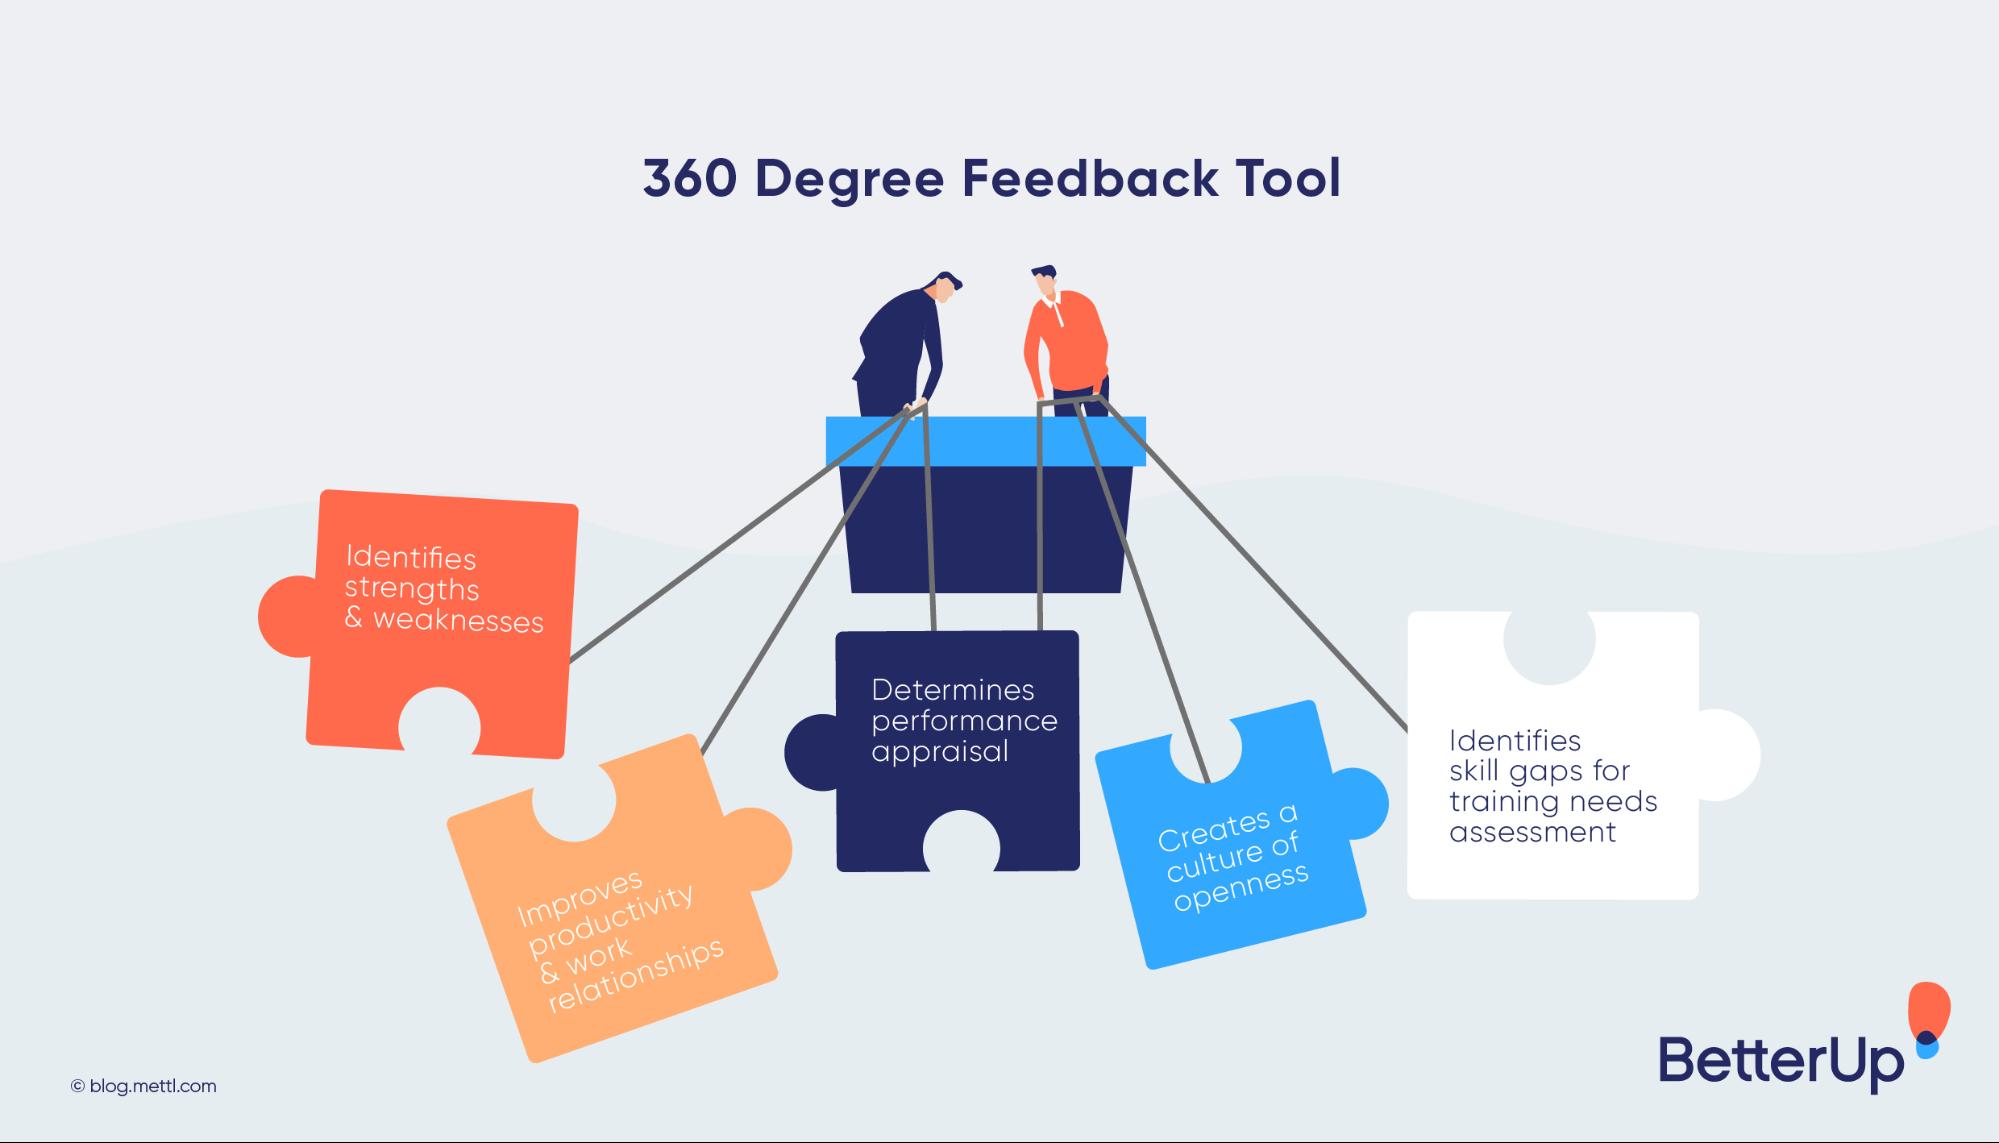 360 degree feedback tool